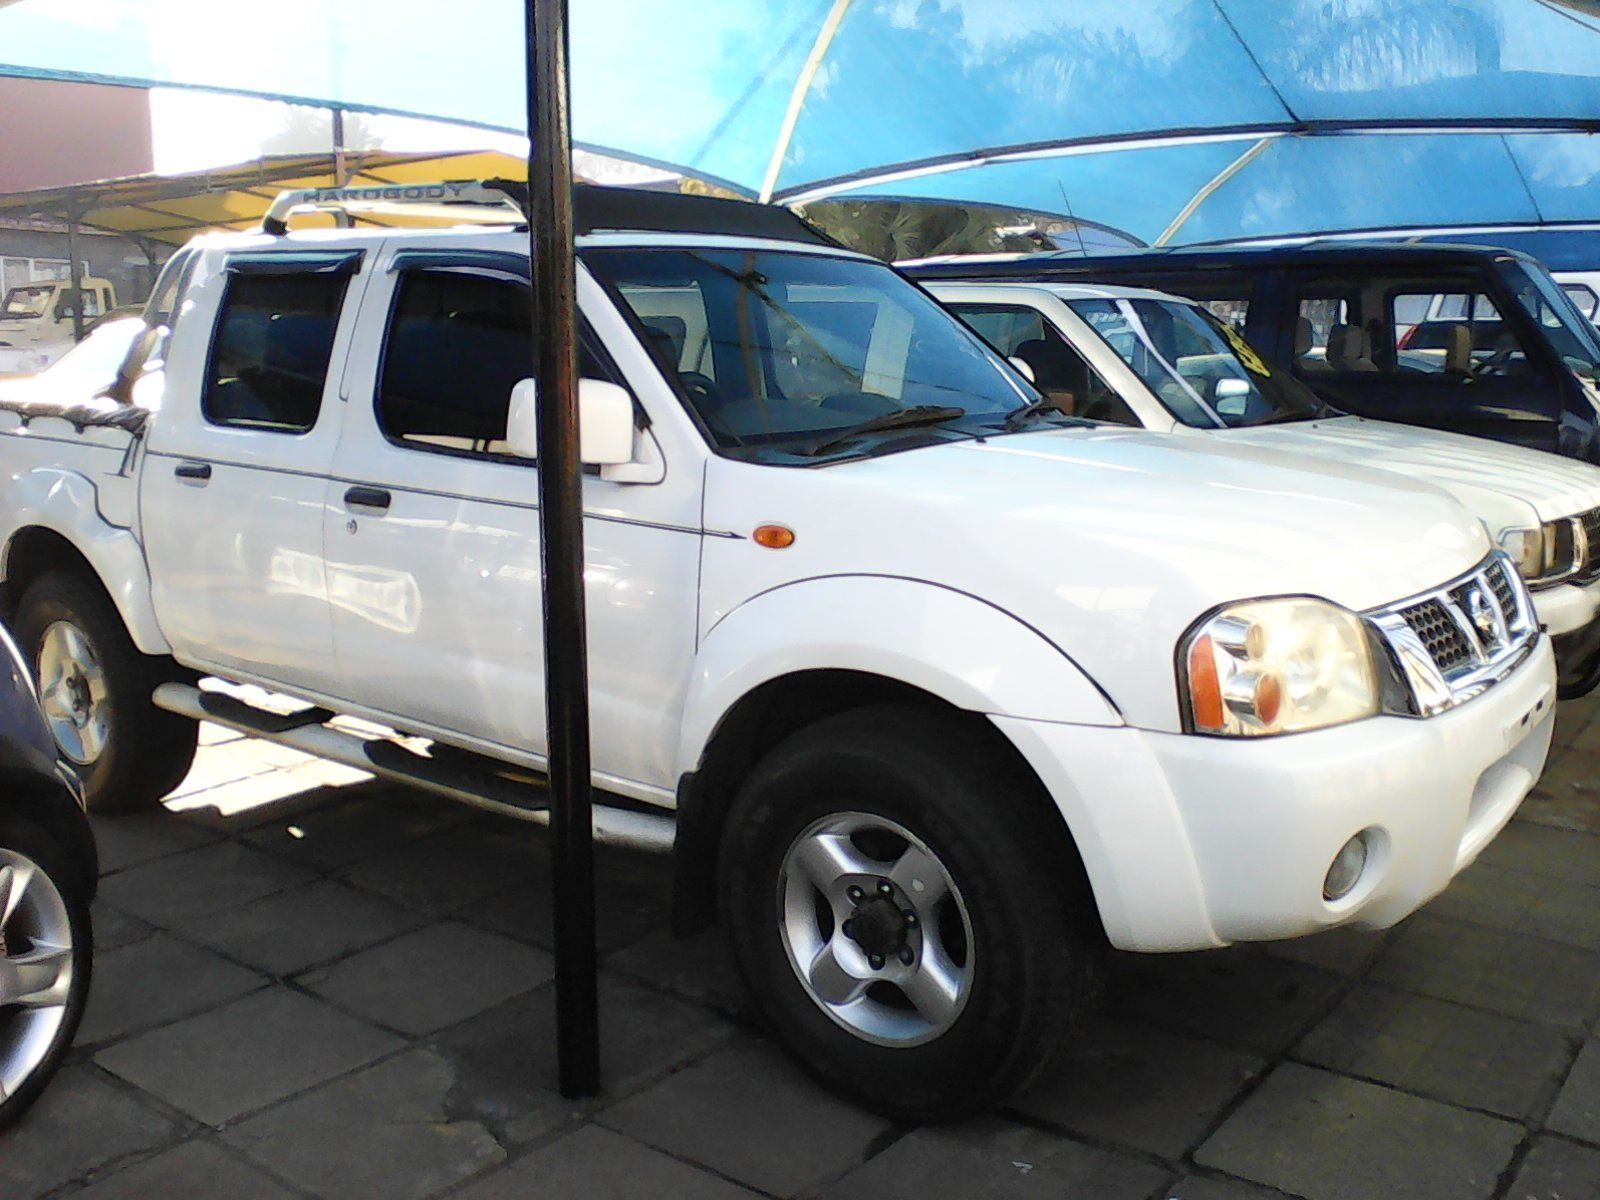 For Nissan Hardbody 3000td Sel 4x4 J85 2003 Bakkie Double Cab Used Price R105000 Gauteng